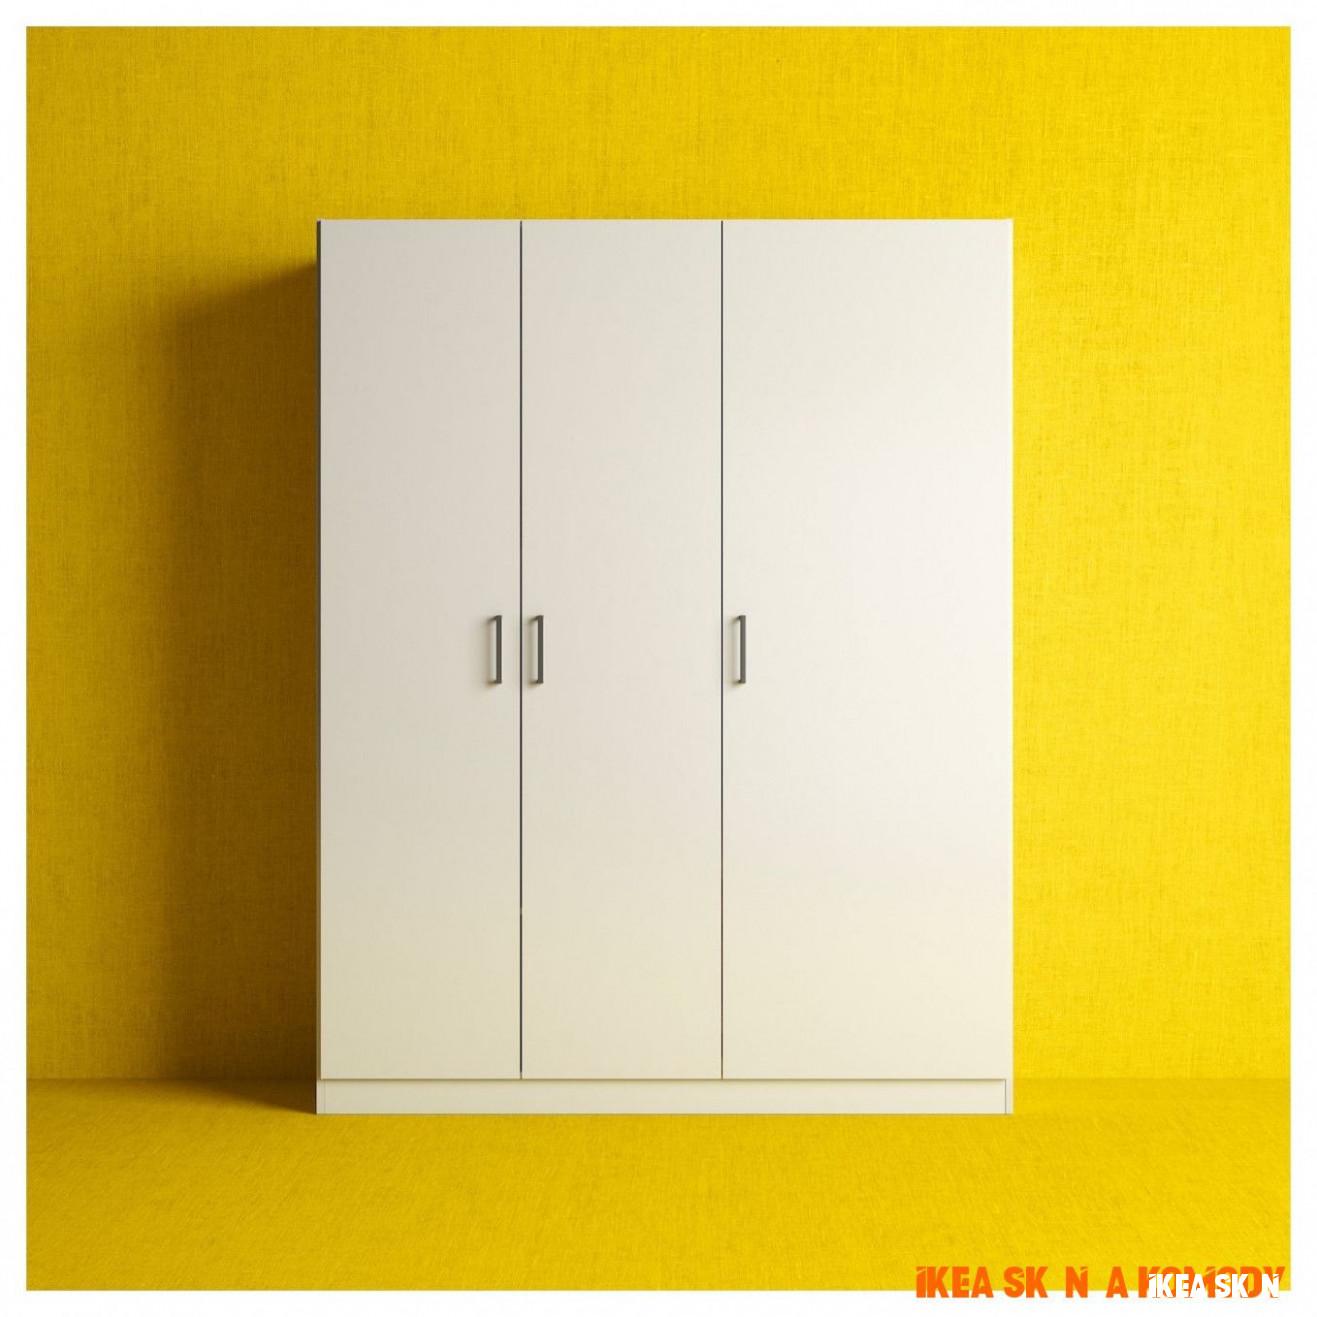 Ikea skříně